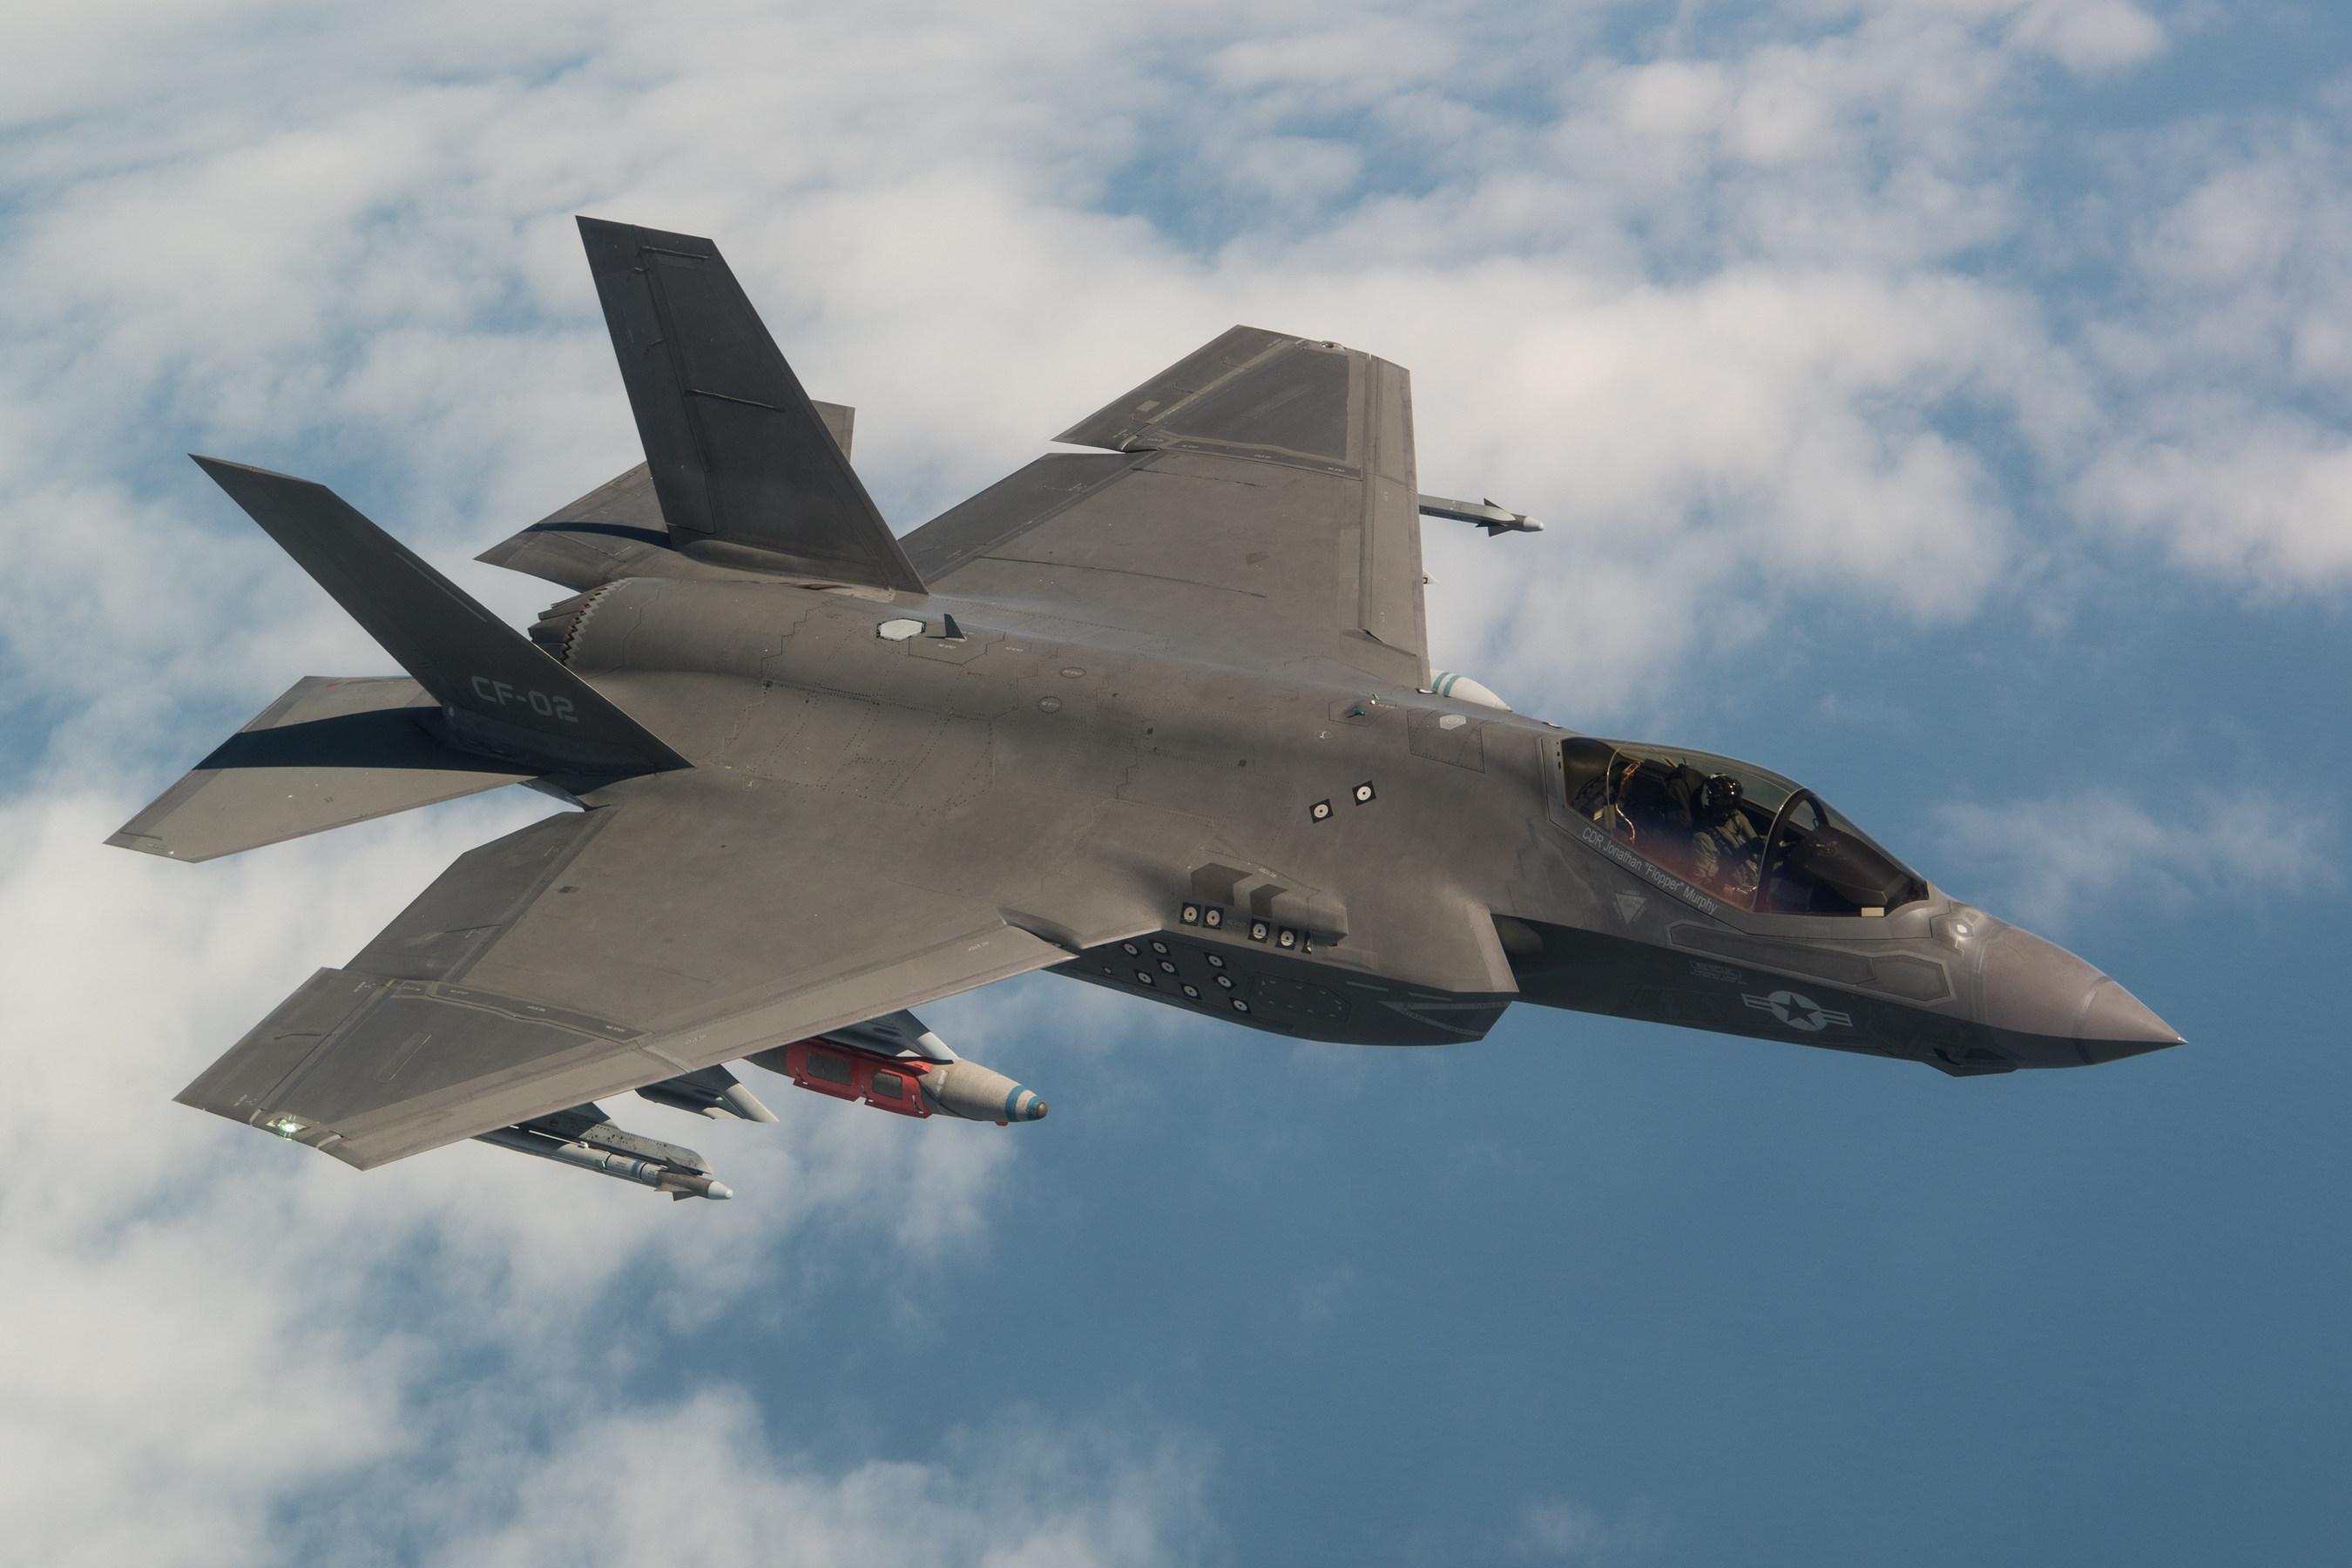 An airborne F-35